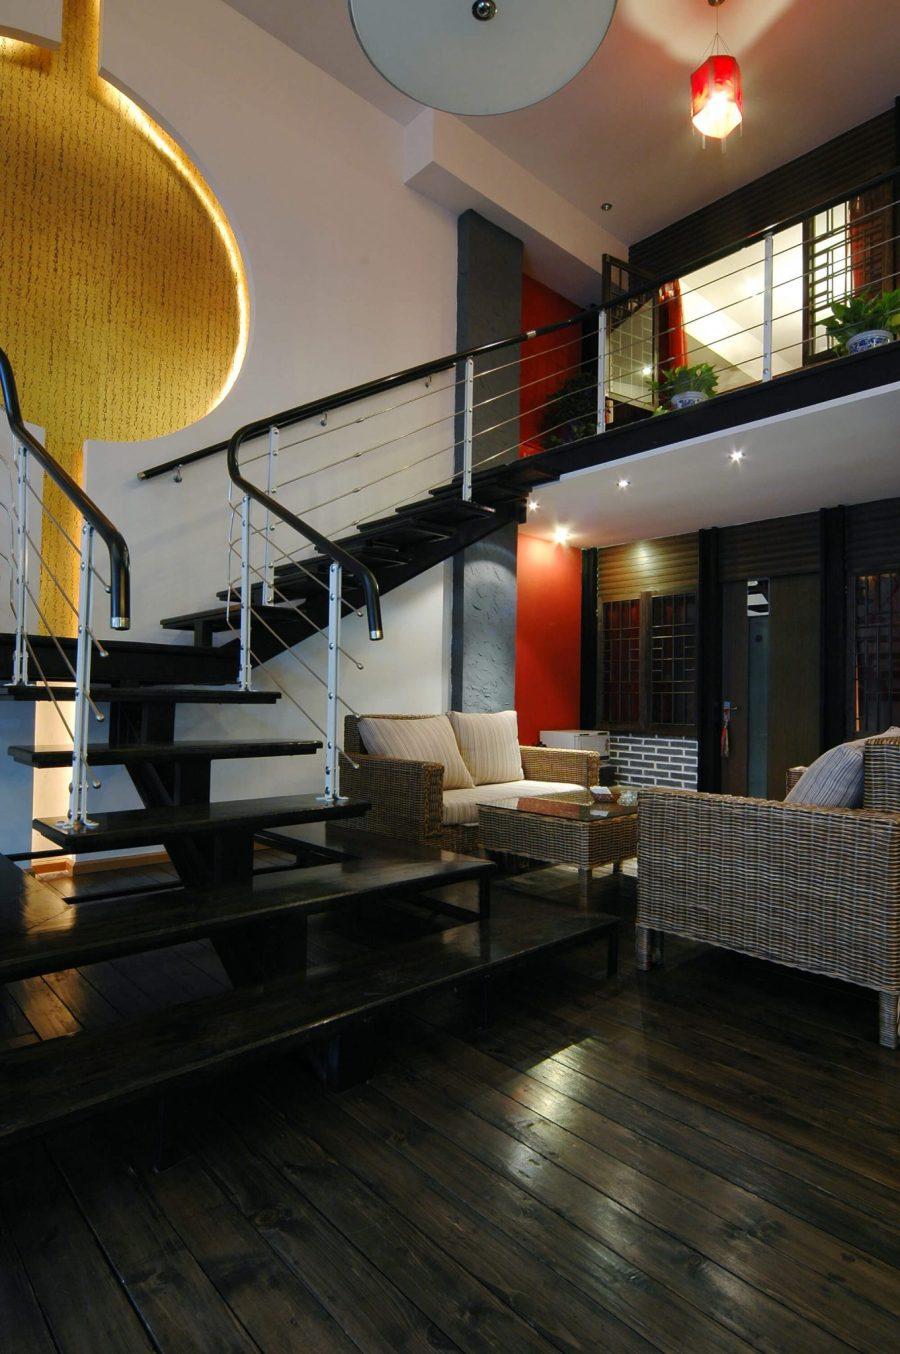 Modern home with a loft